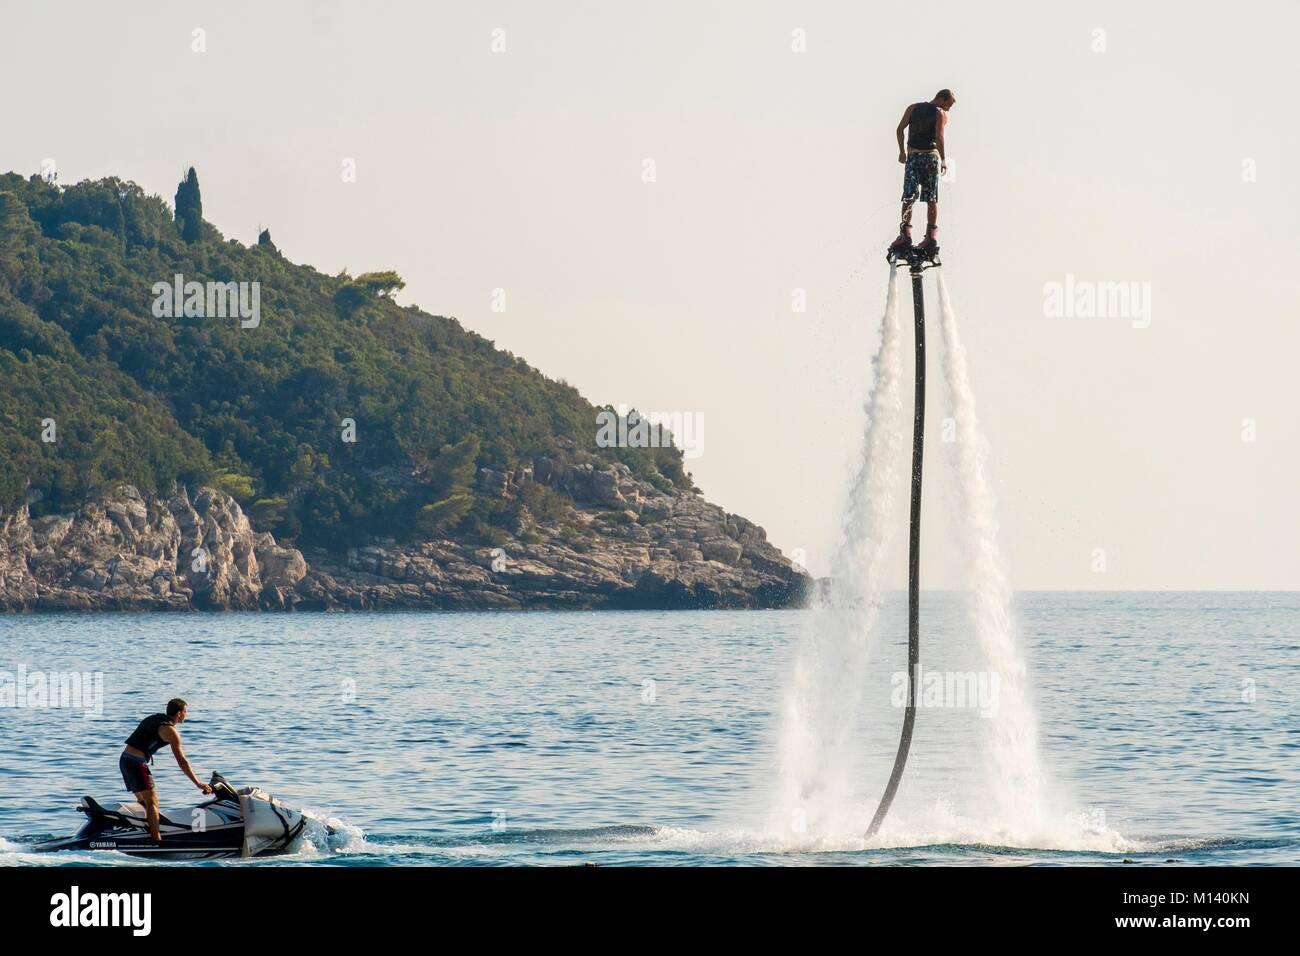 Croatia, Central Dalmatia, Dalmatian coast, Dubrovnik, Flyboard: water jetpack connected to a watercraft (Jet ski) - Stock Image